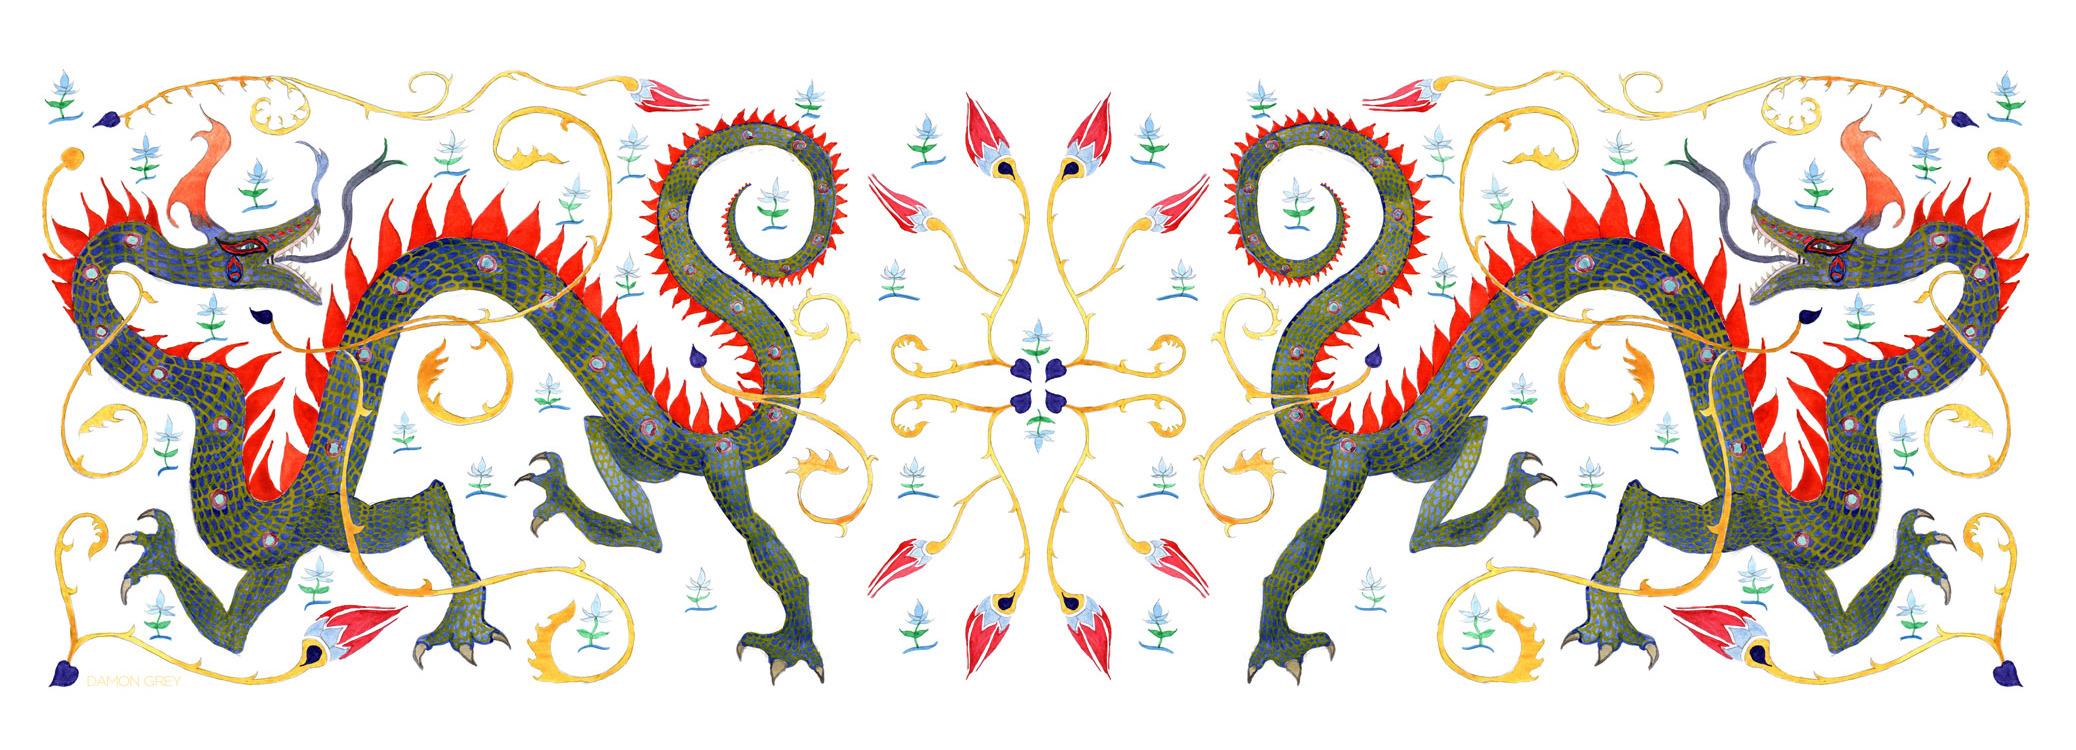 dragon-orig-multi.jpg